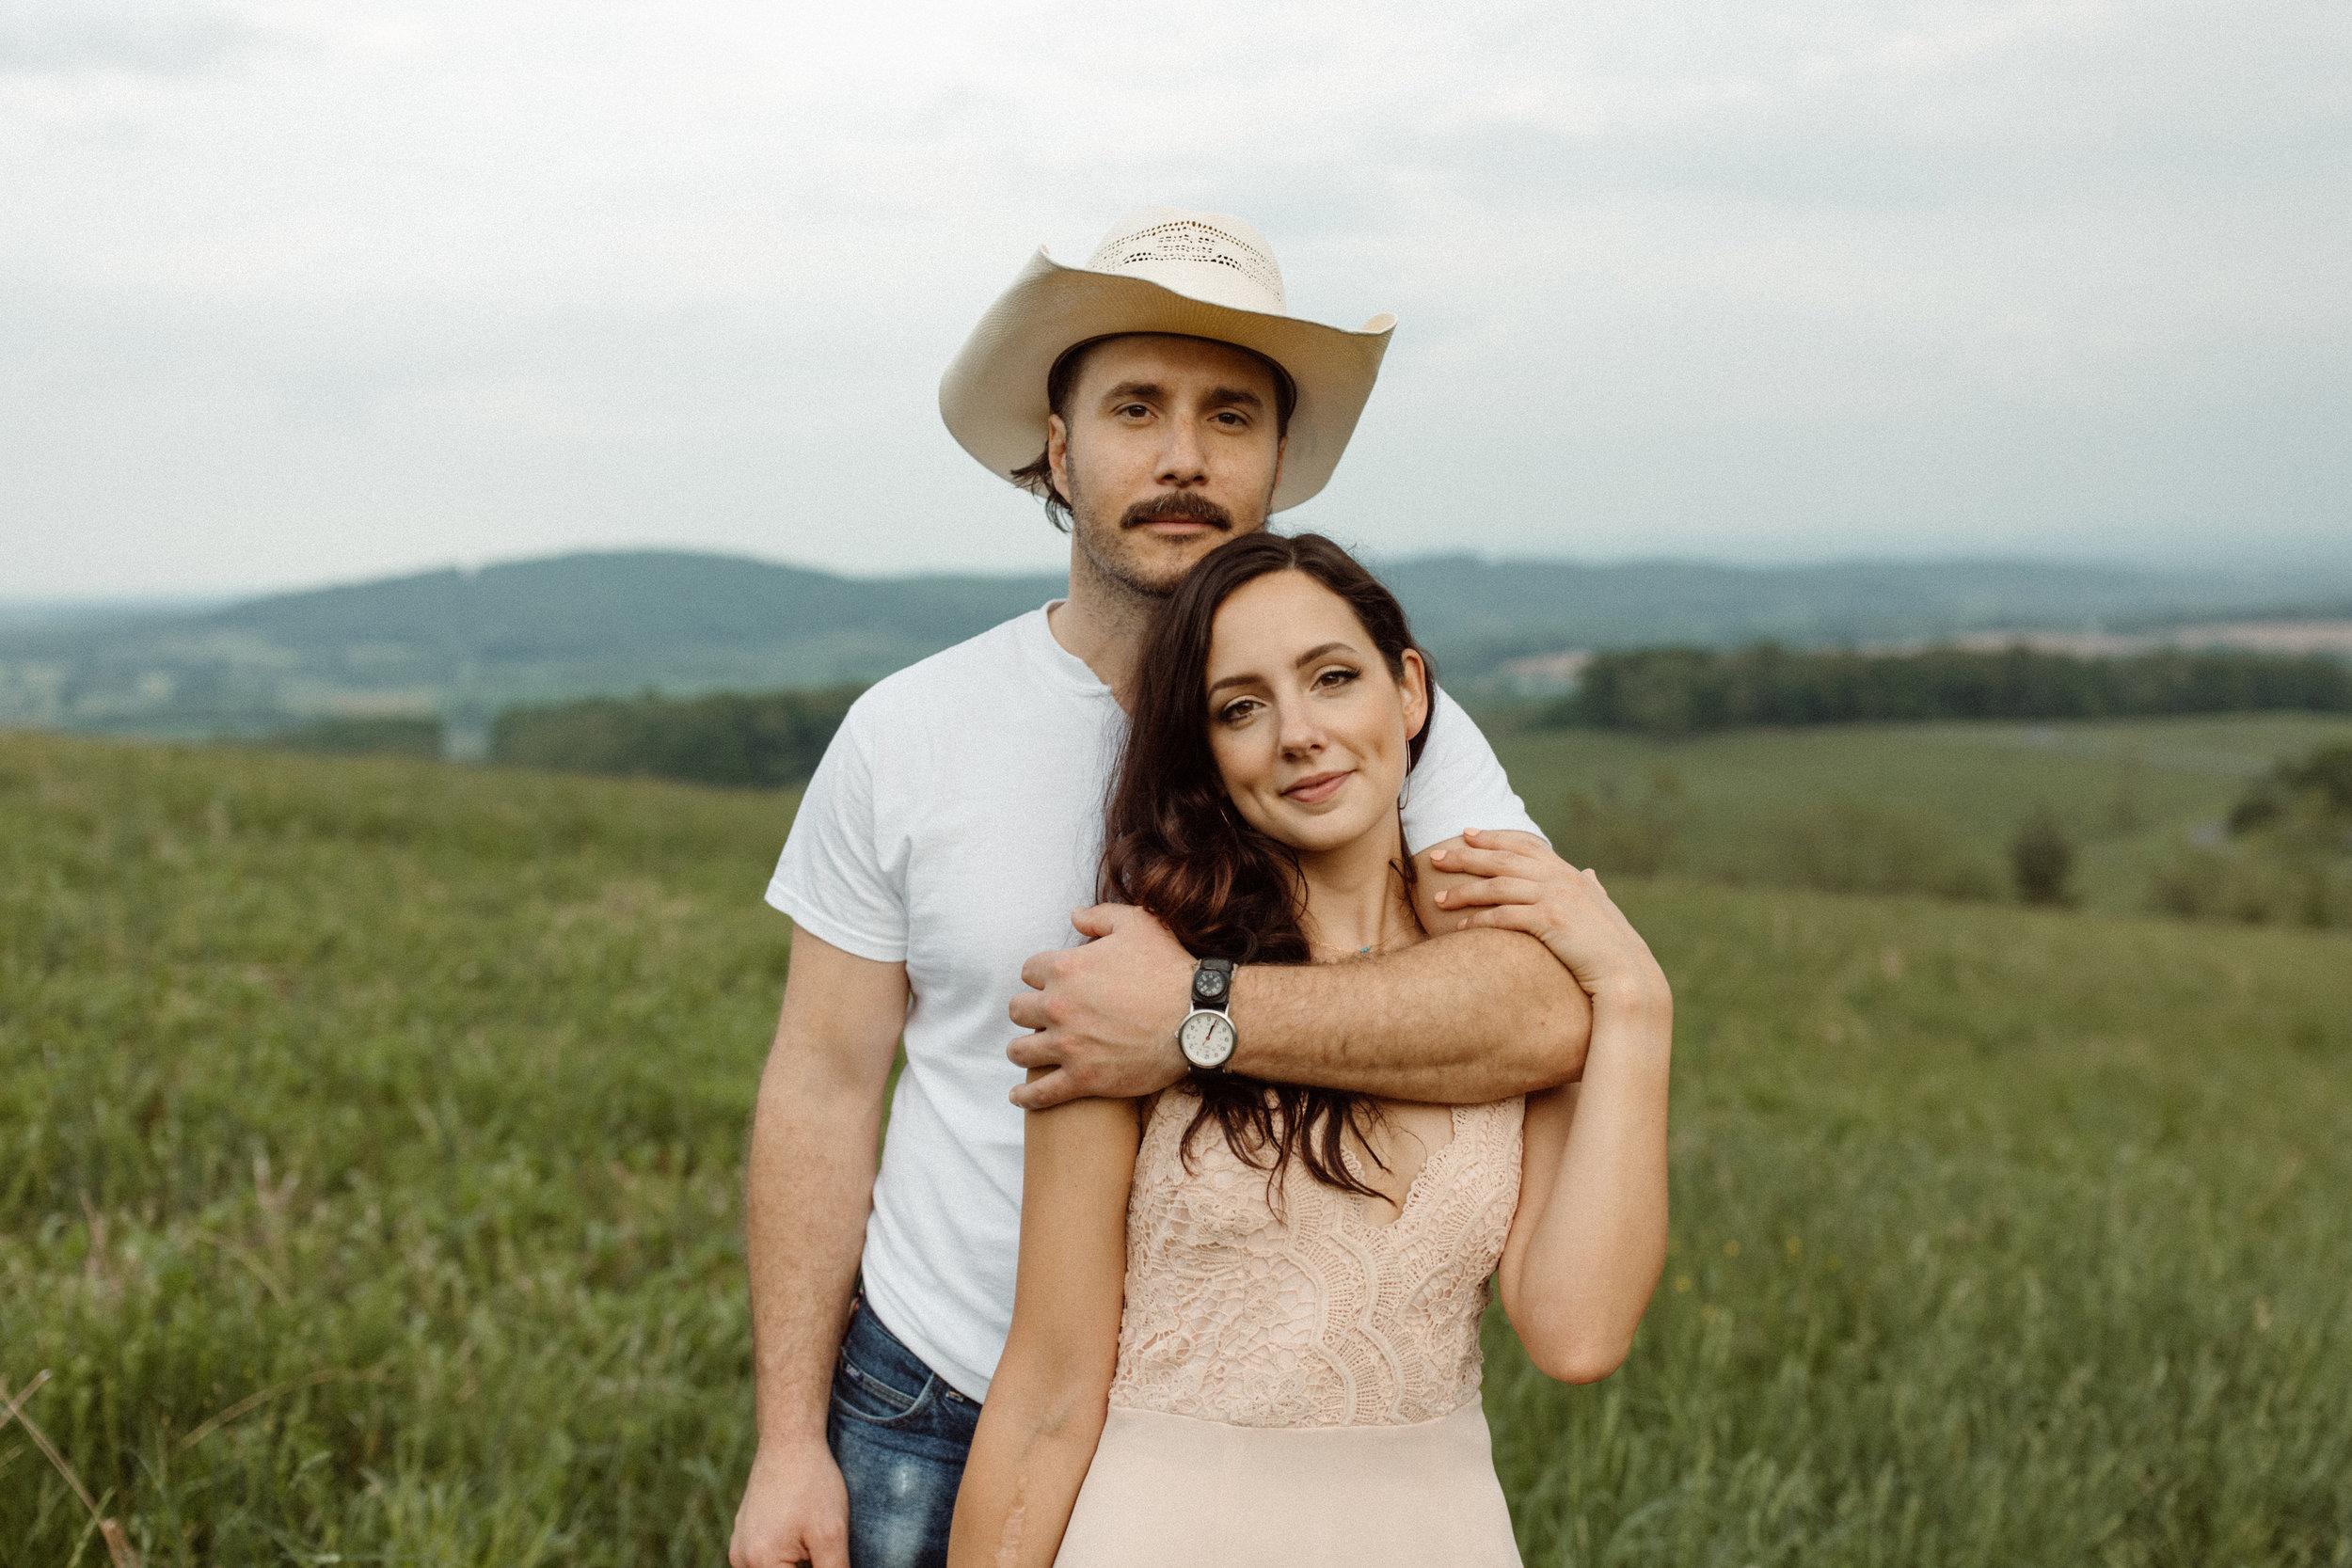 kelsey&mark-engagement-skymeadows-2019-peytoncurry-9331.jpg